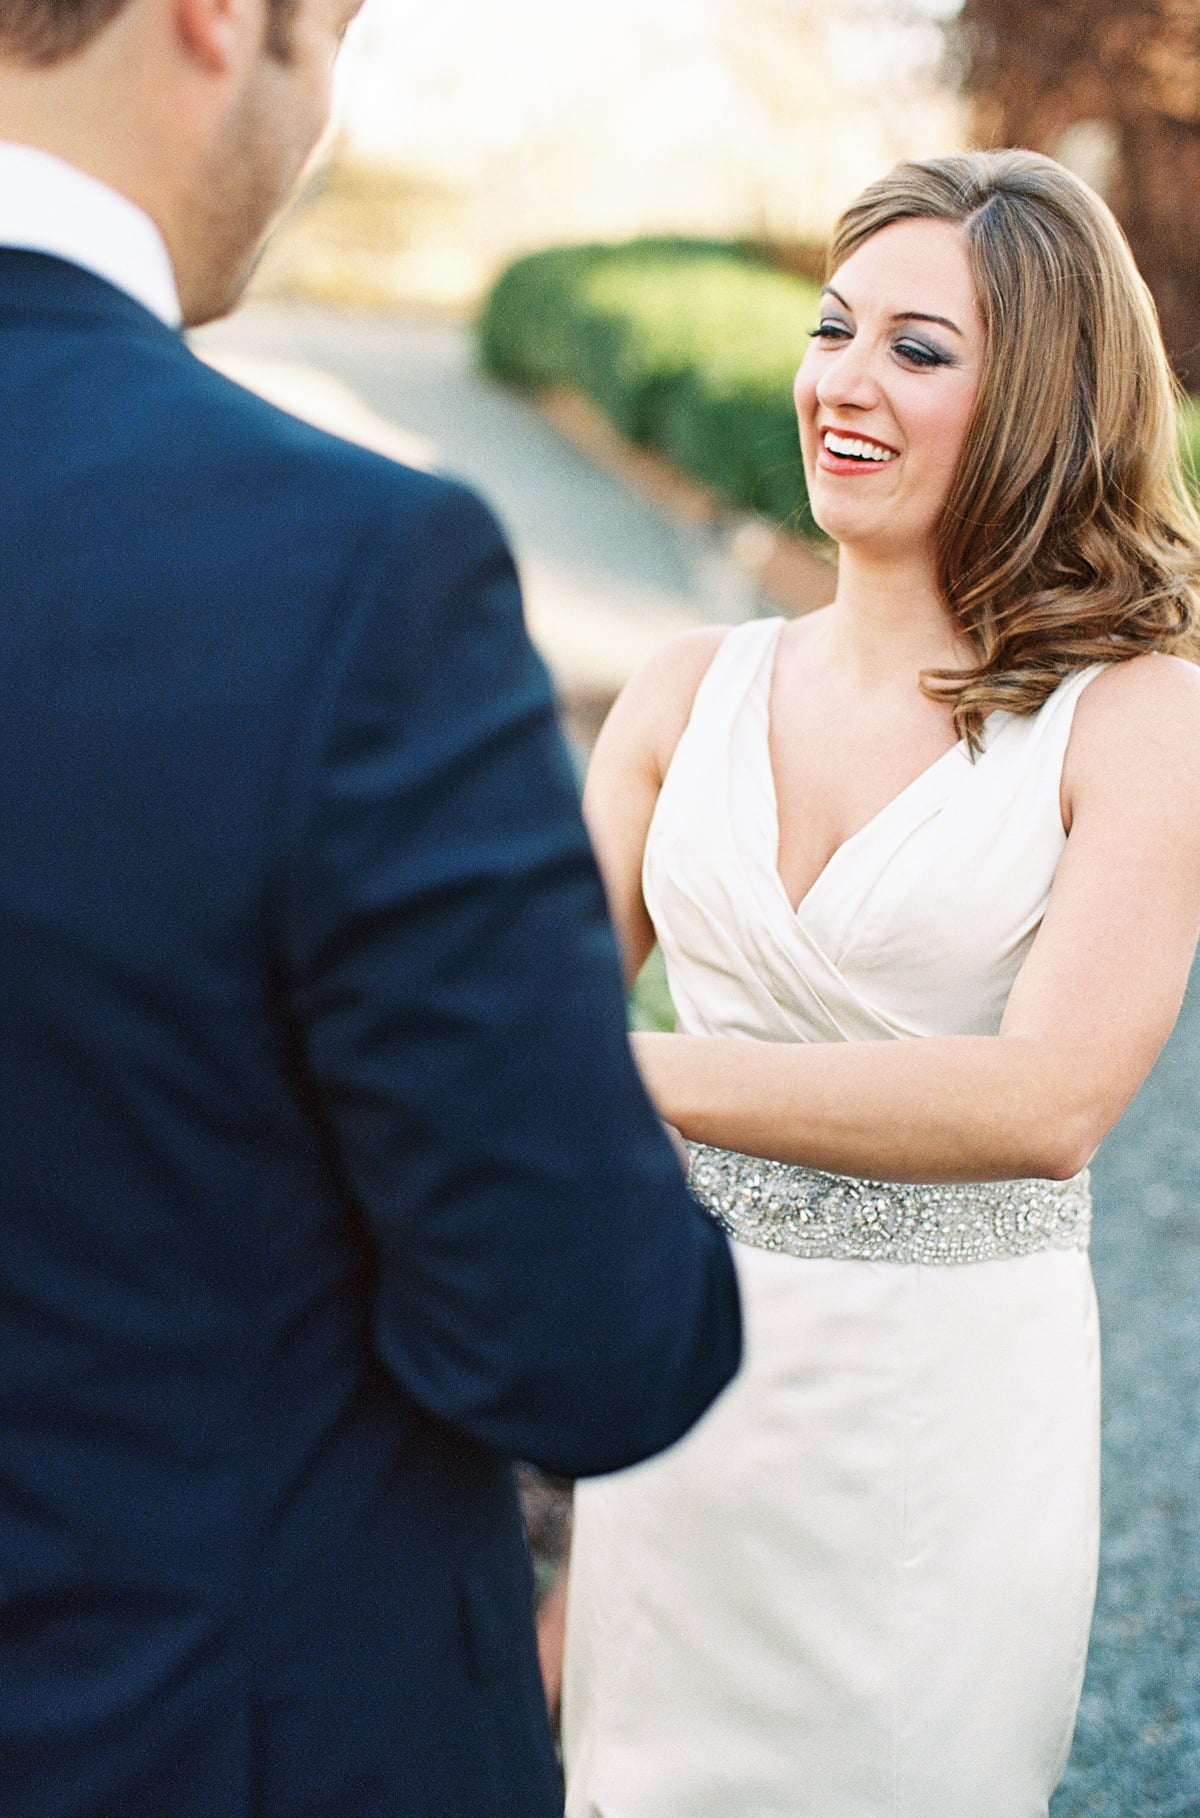 clifton-inn-wedding-024.jpg